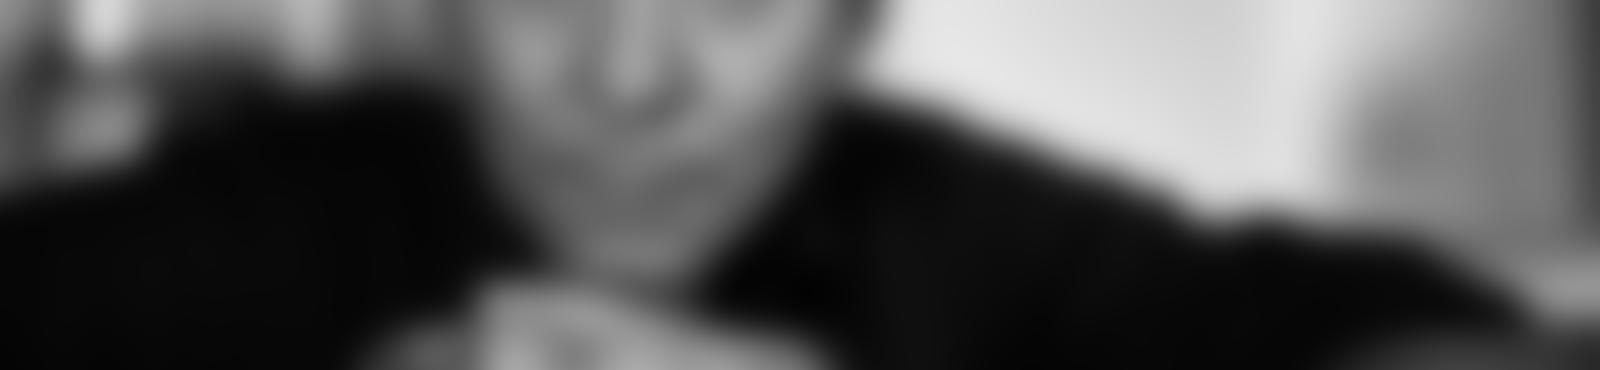 Blurred 23f6dfa3 9401 492f 8c07 be4062efaedb